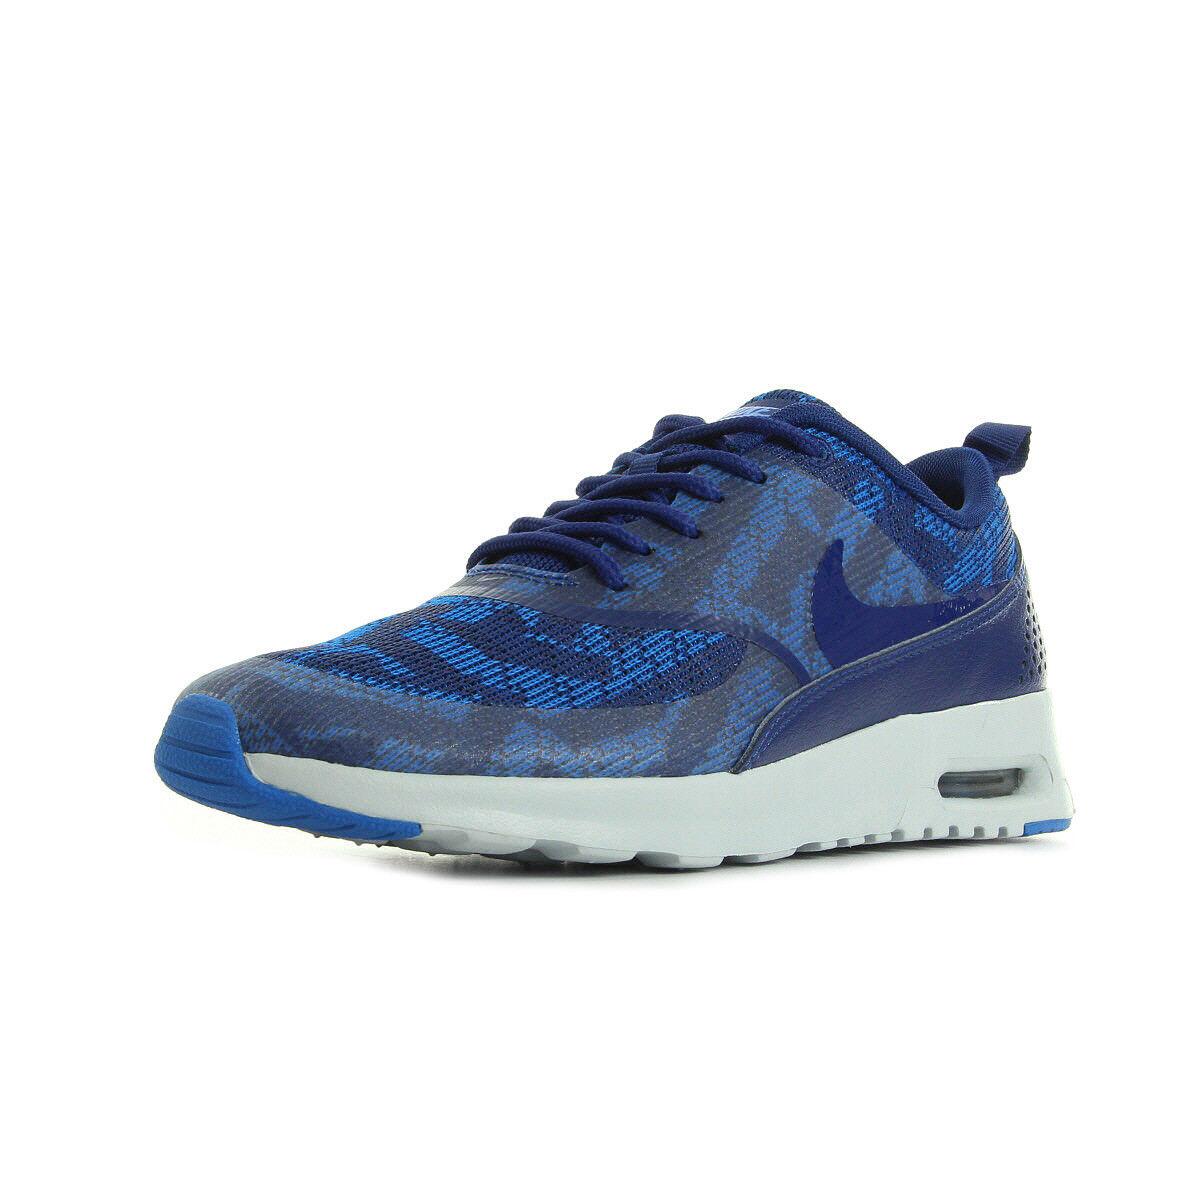 Chaussures Baskets Nike femme Air Max Thea Jacquard taille Bleu Bleue